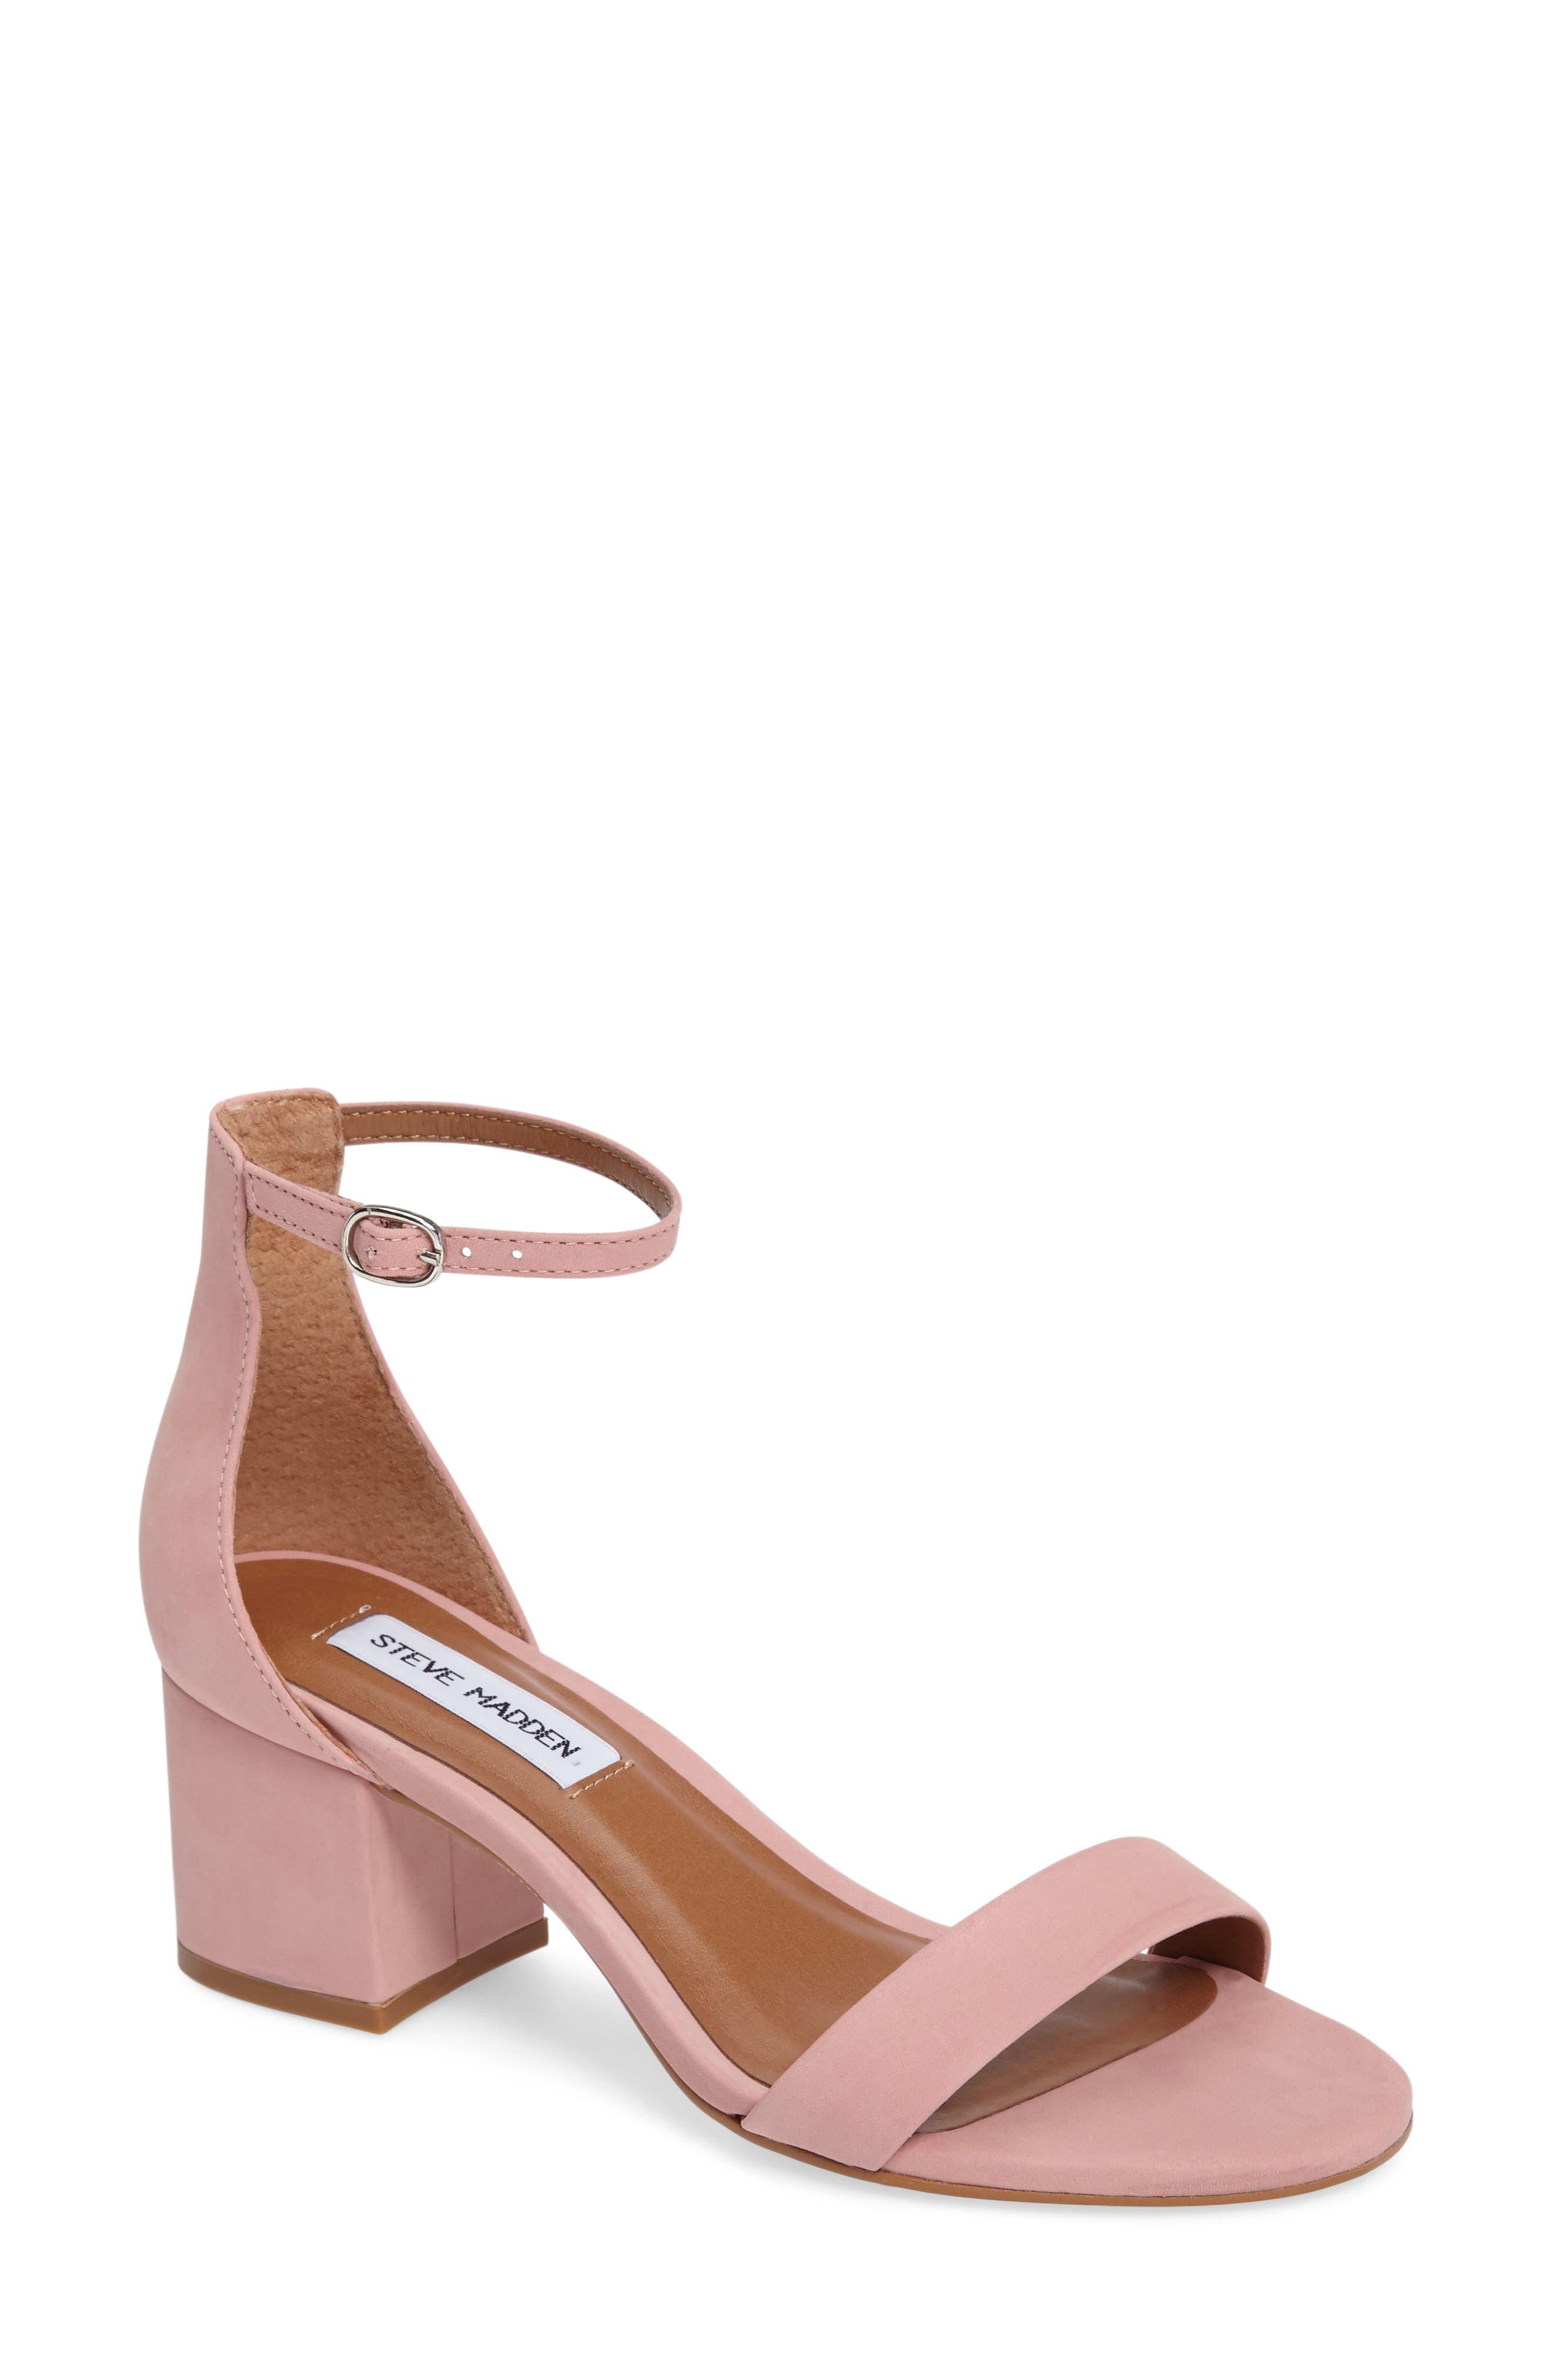 Irenee Ankle Strap Sandal,                             Main thumbnail 25, color,